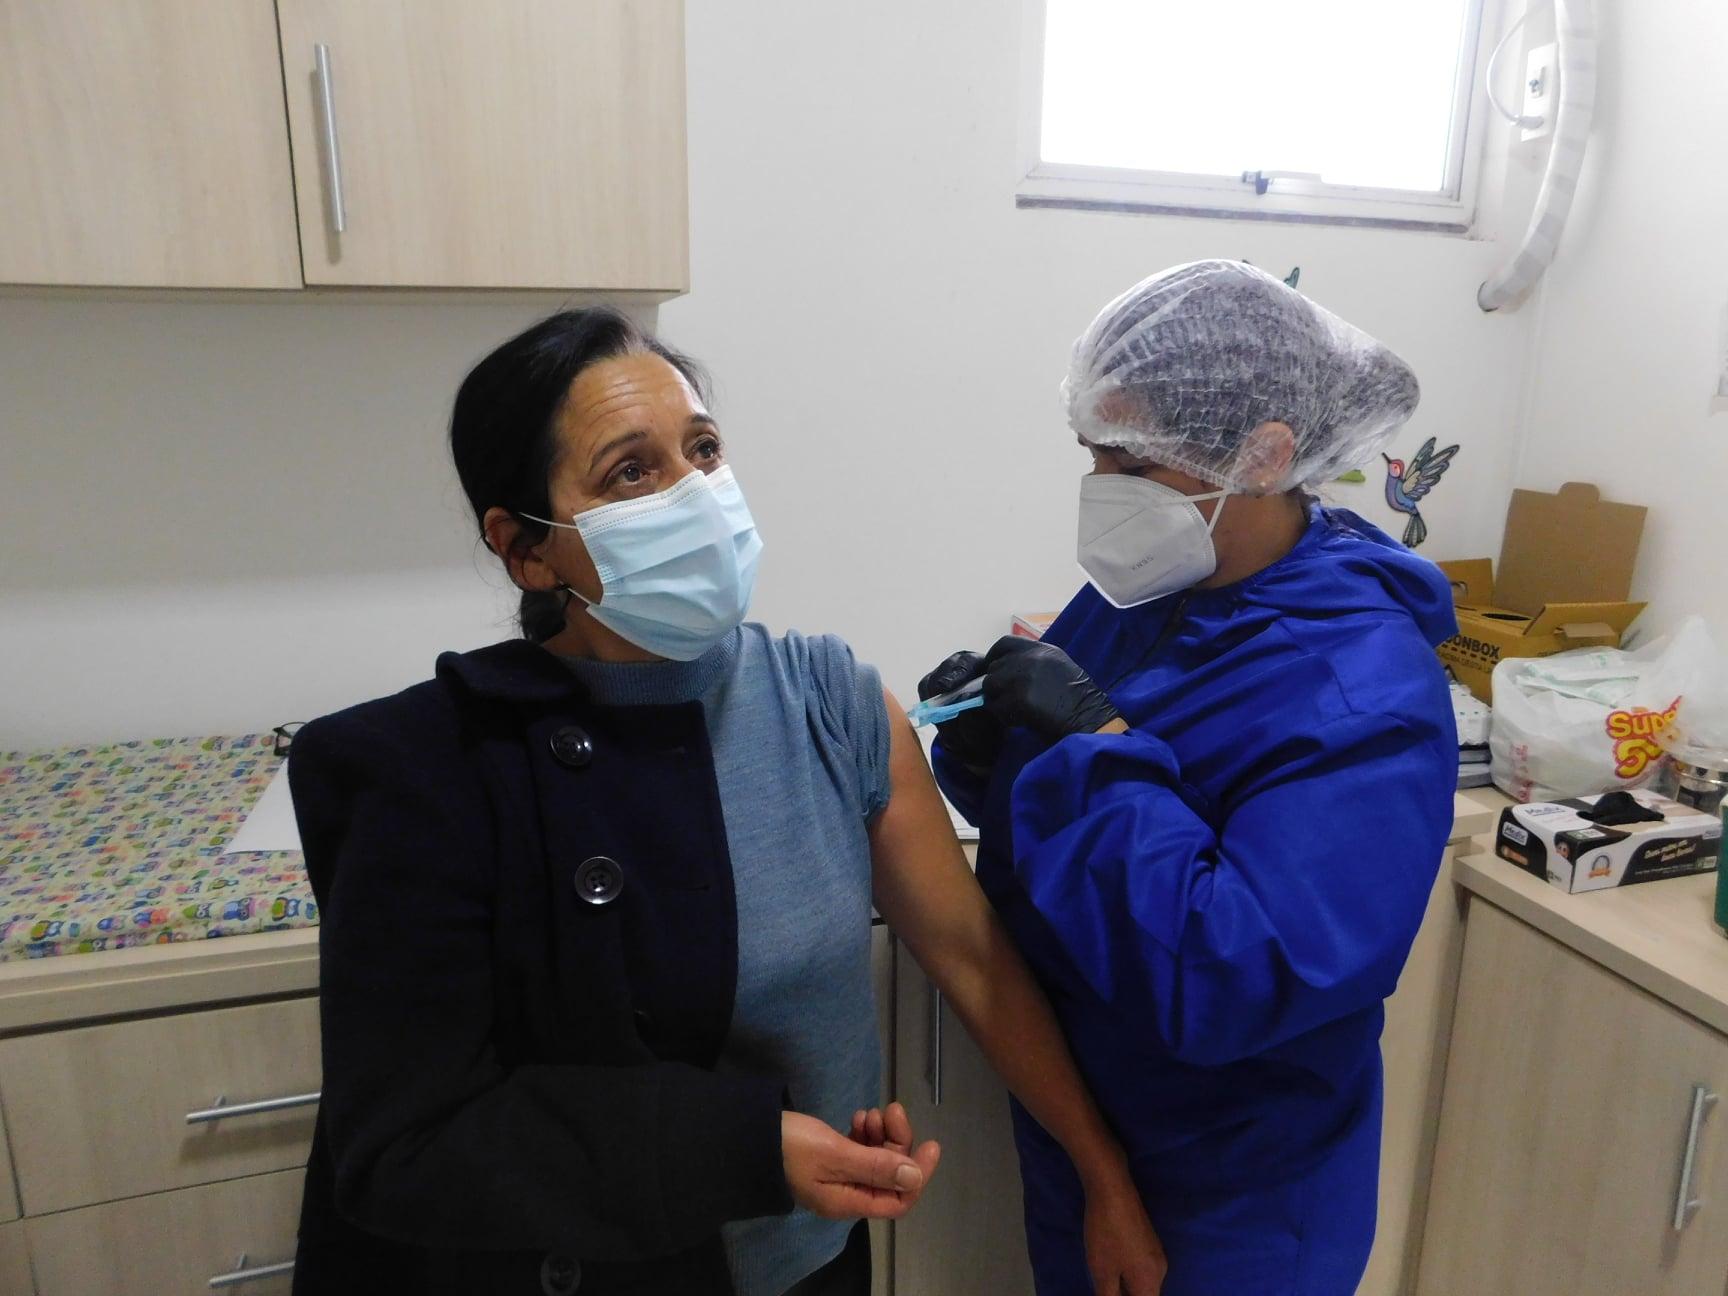 Salto do Jacuí aplicou mais de 600 doses de vacinas contra Covid-19 no final de semana